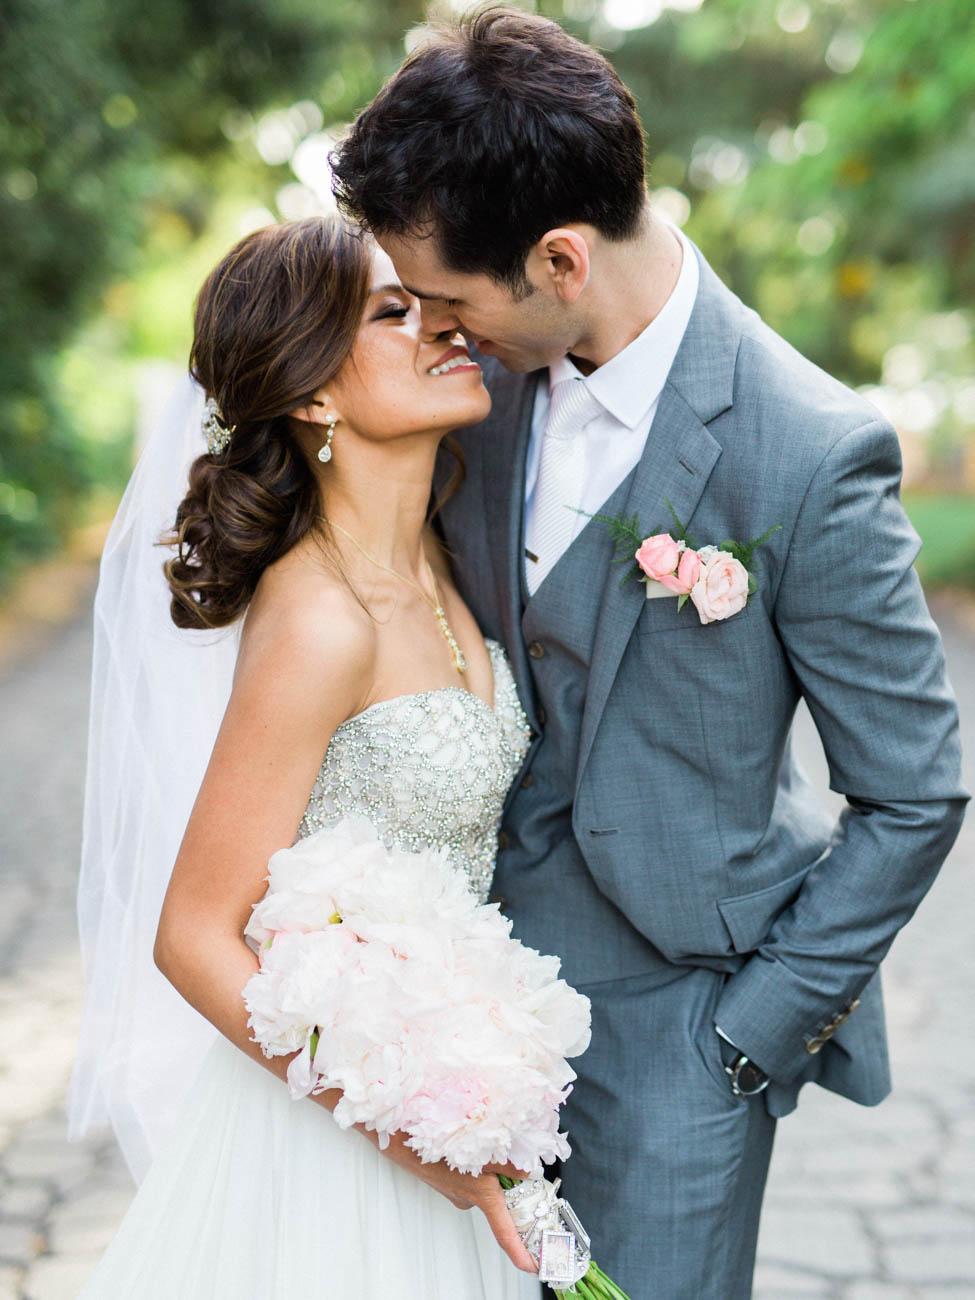 dennisroycoronel_wedding-75.jpg